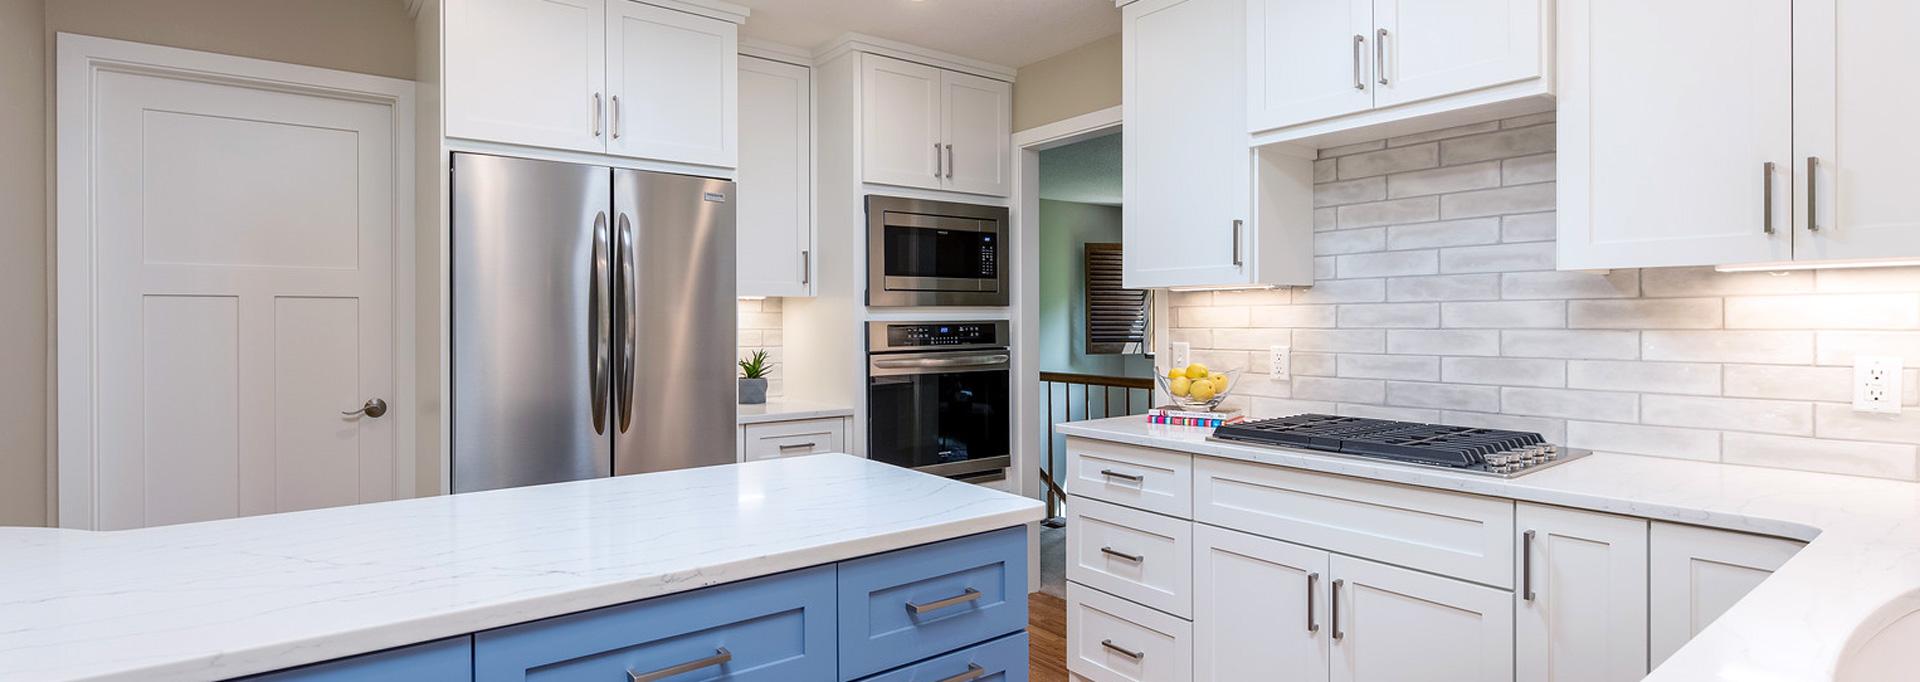 experienced-kitchen-contractor.jpg